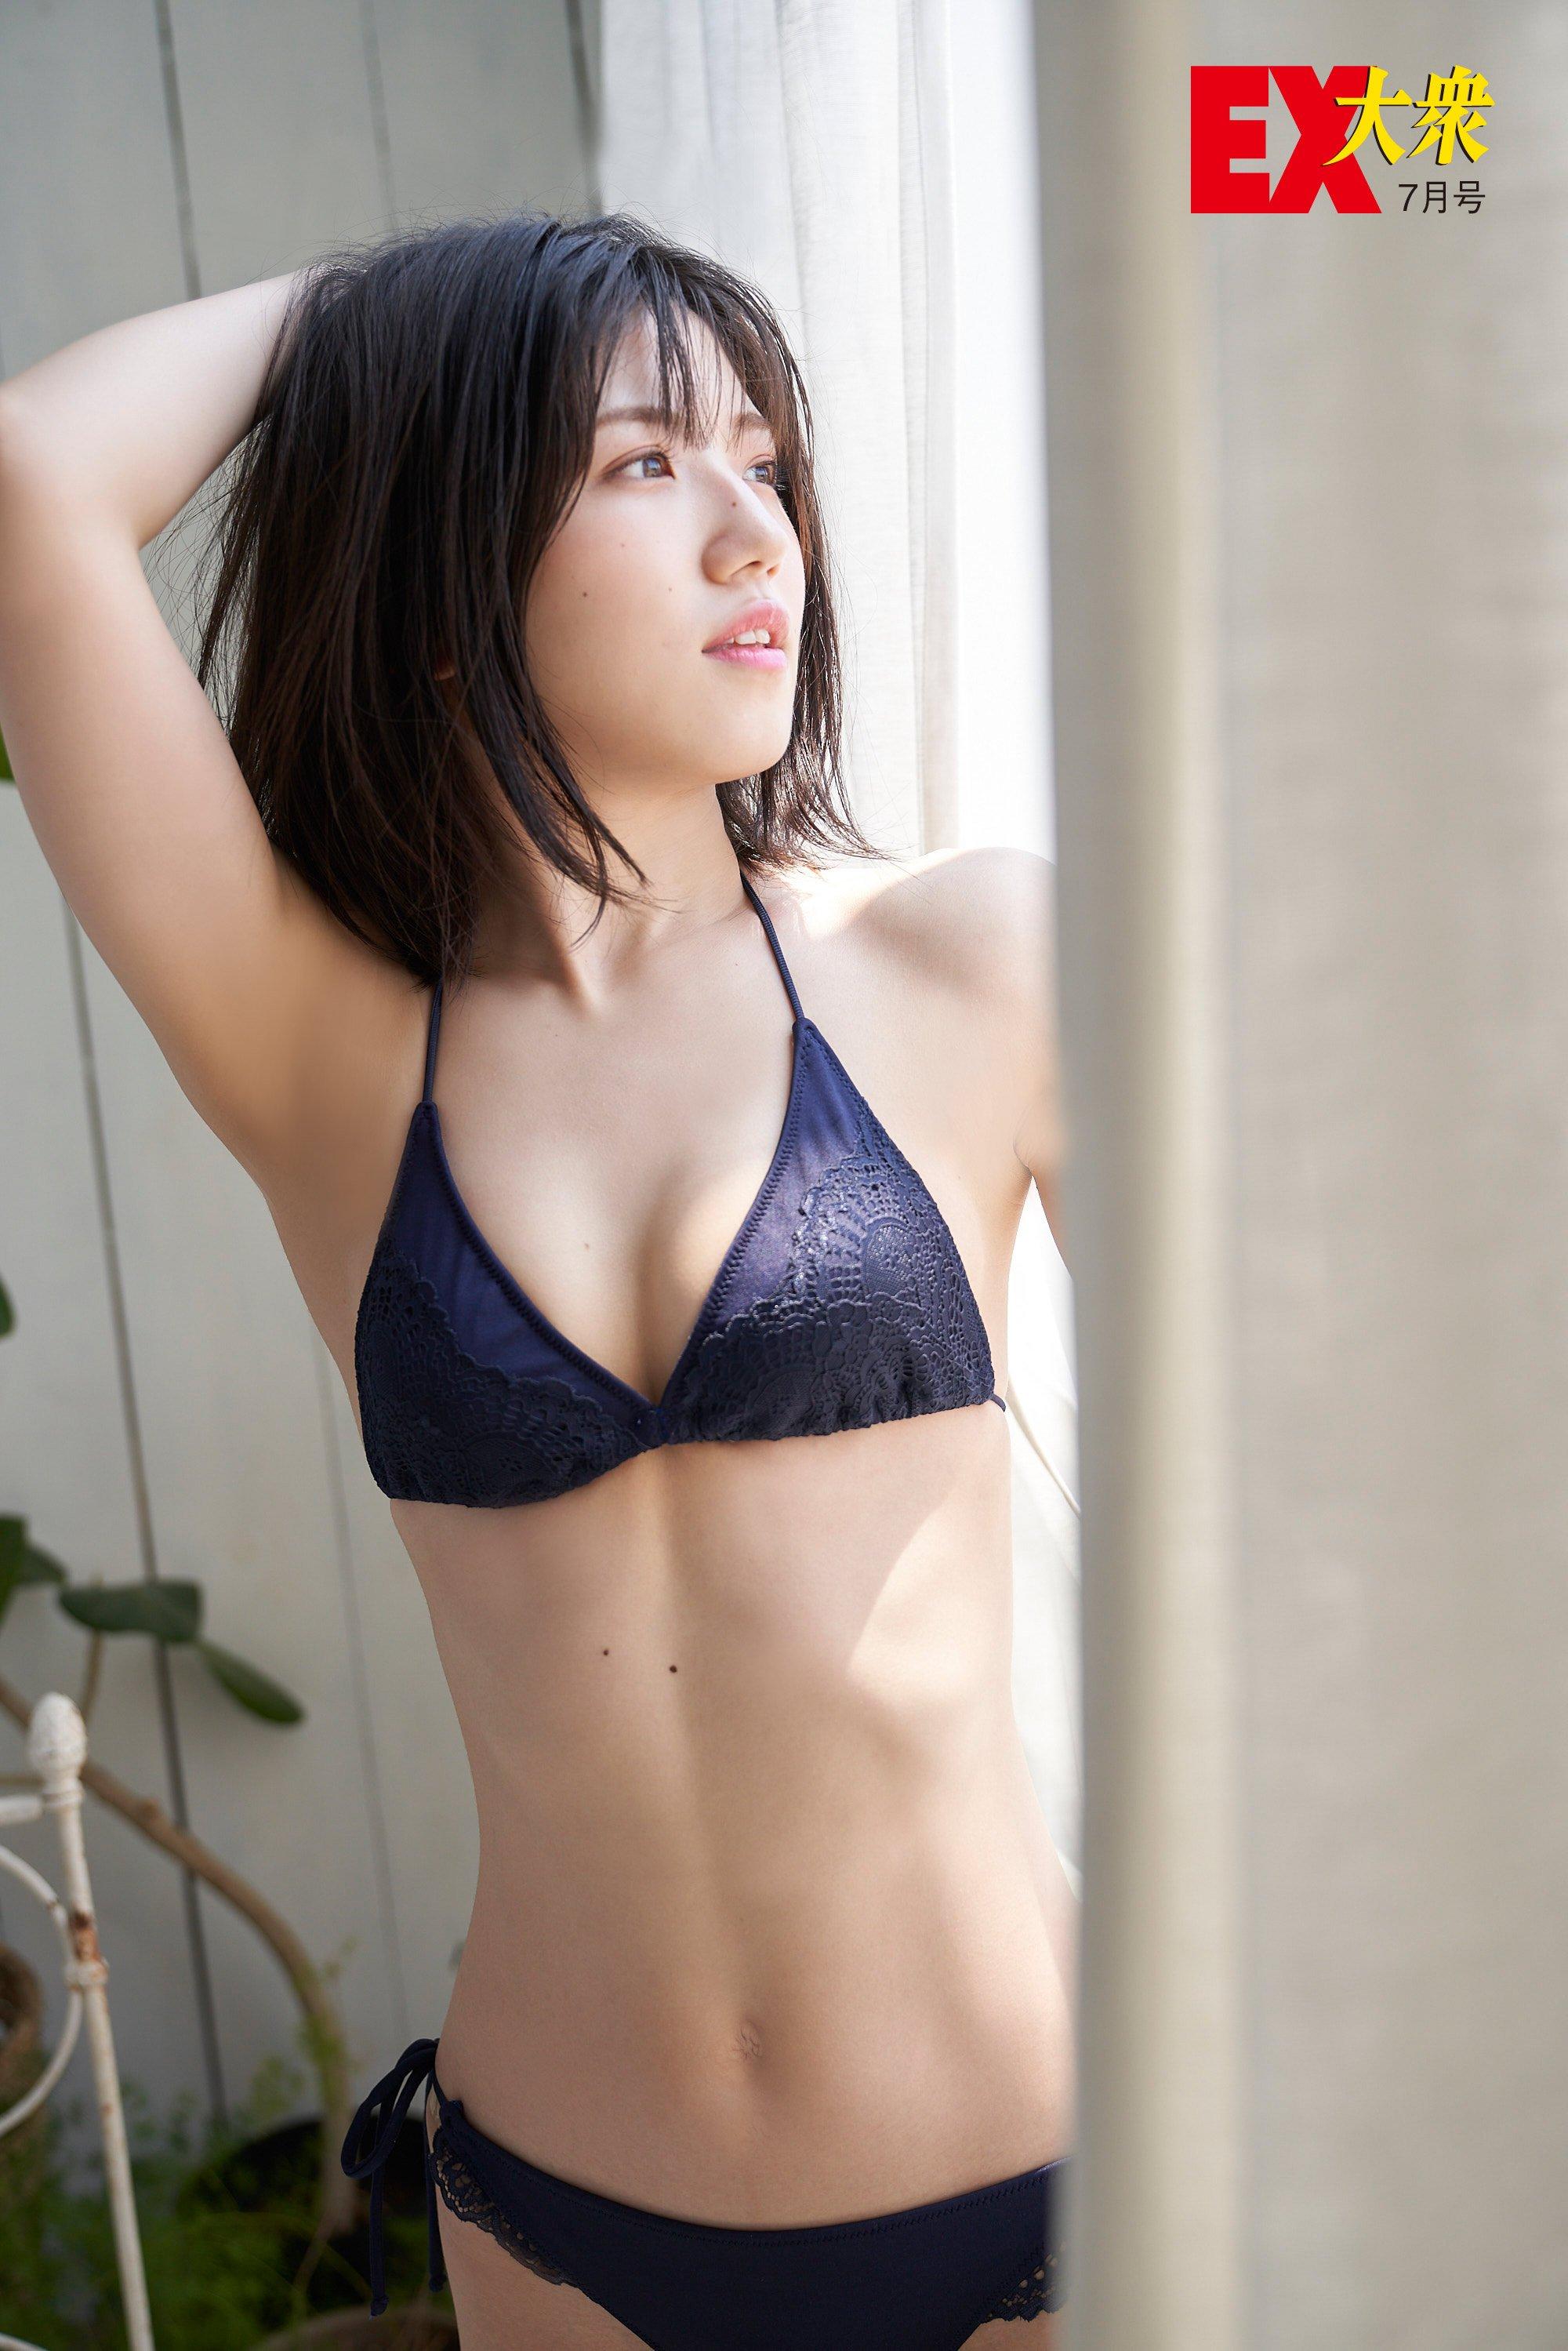 AKB48村山彩希の本誌未掲載カット10枚を大公開!【EX大衆7月号】の画像004